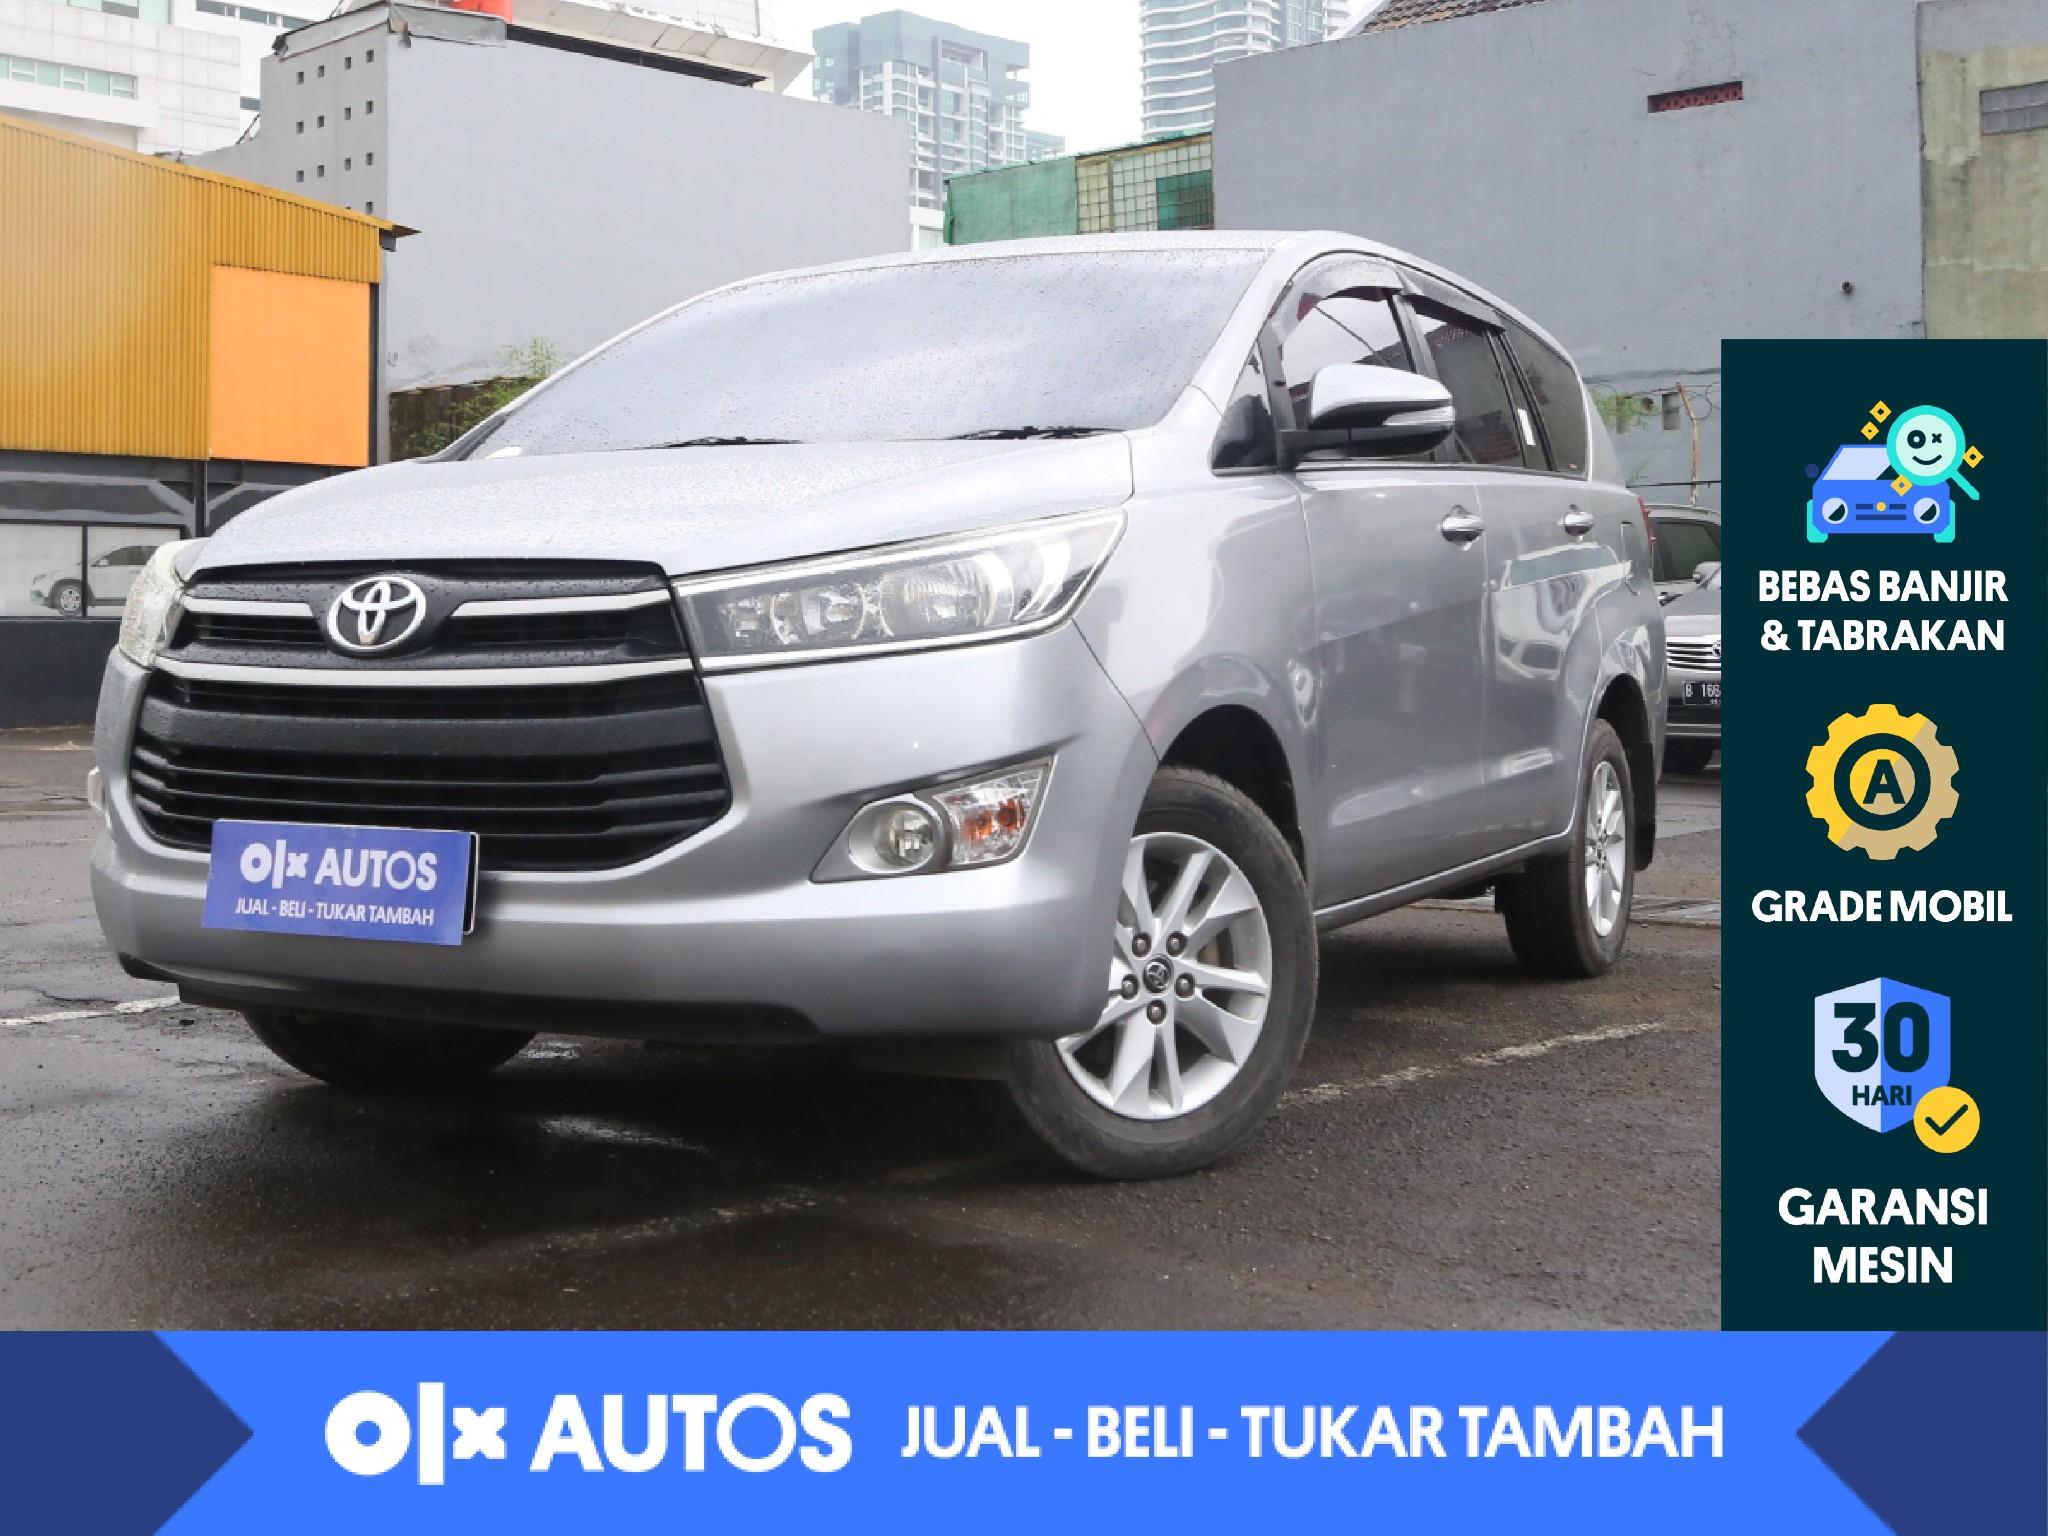 [OLXAutos] Toyota Kijang Innova 2.4 G Solar M/T 2016 Silver